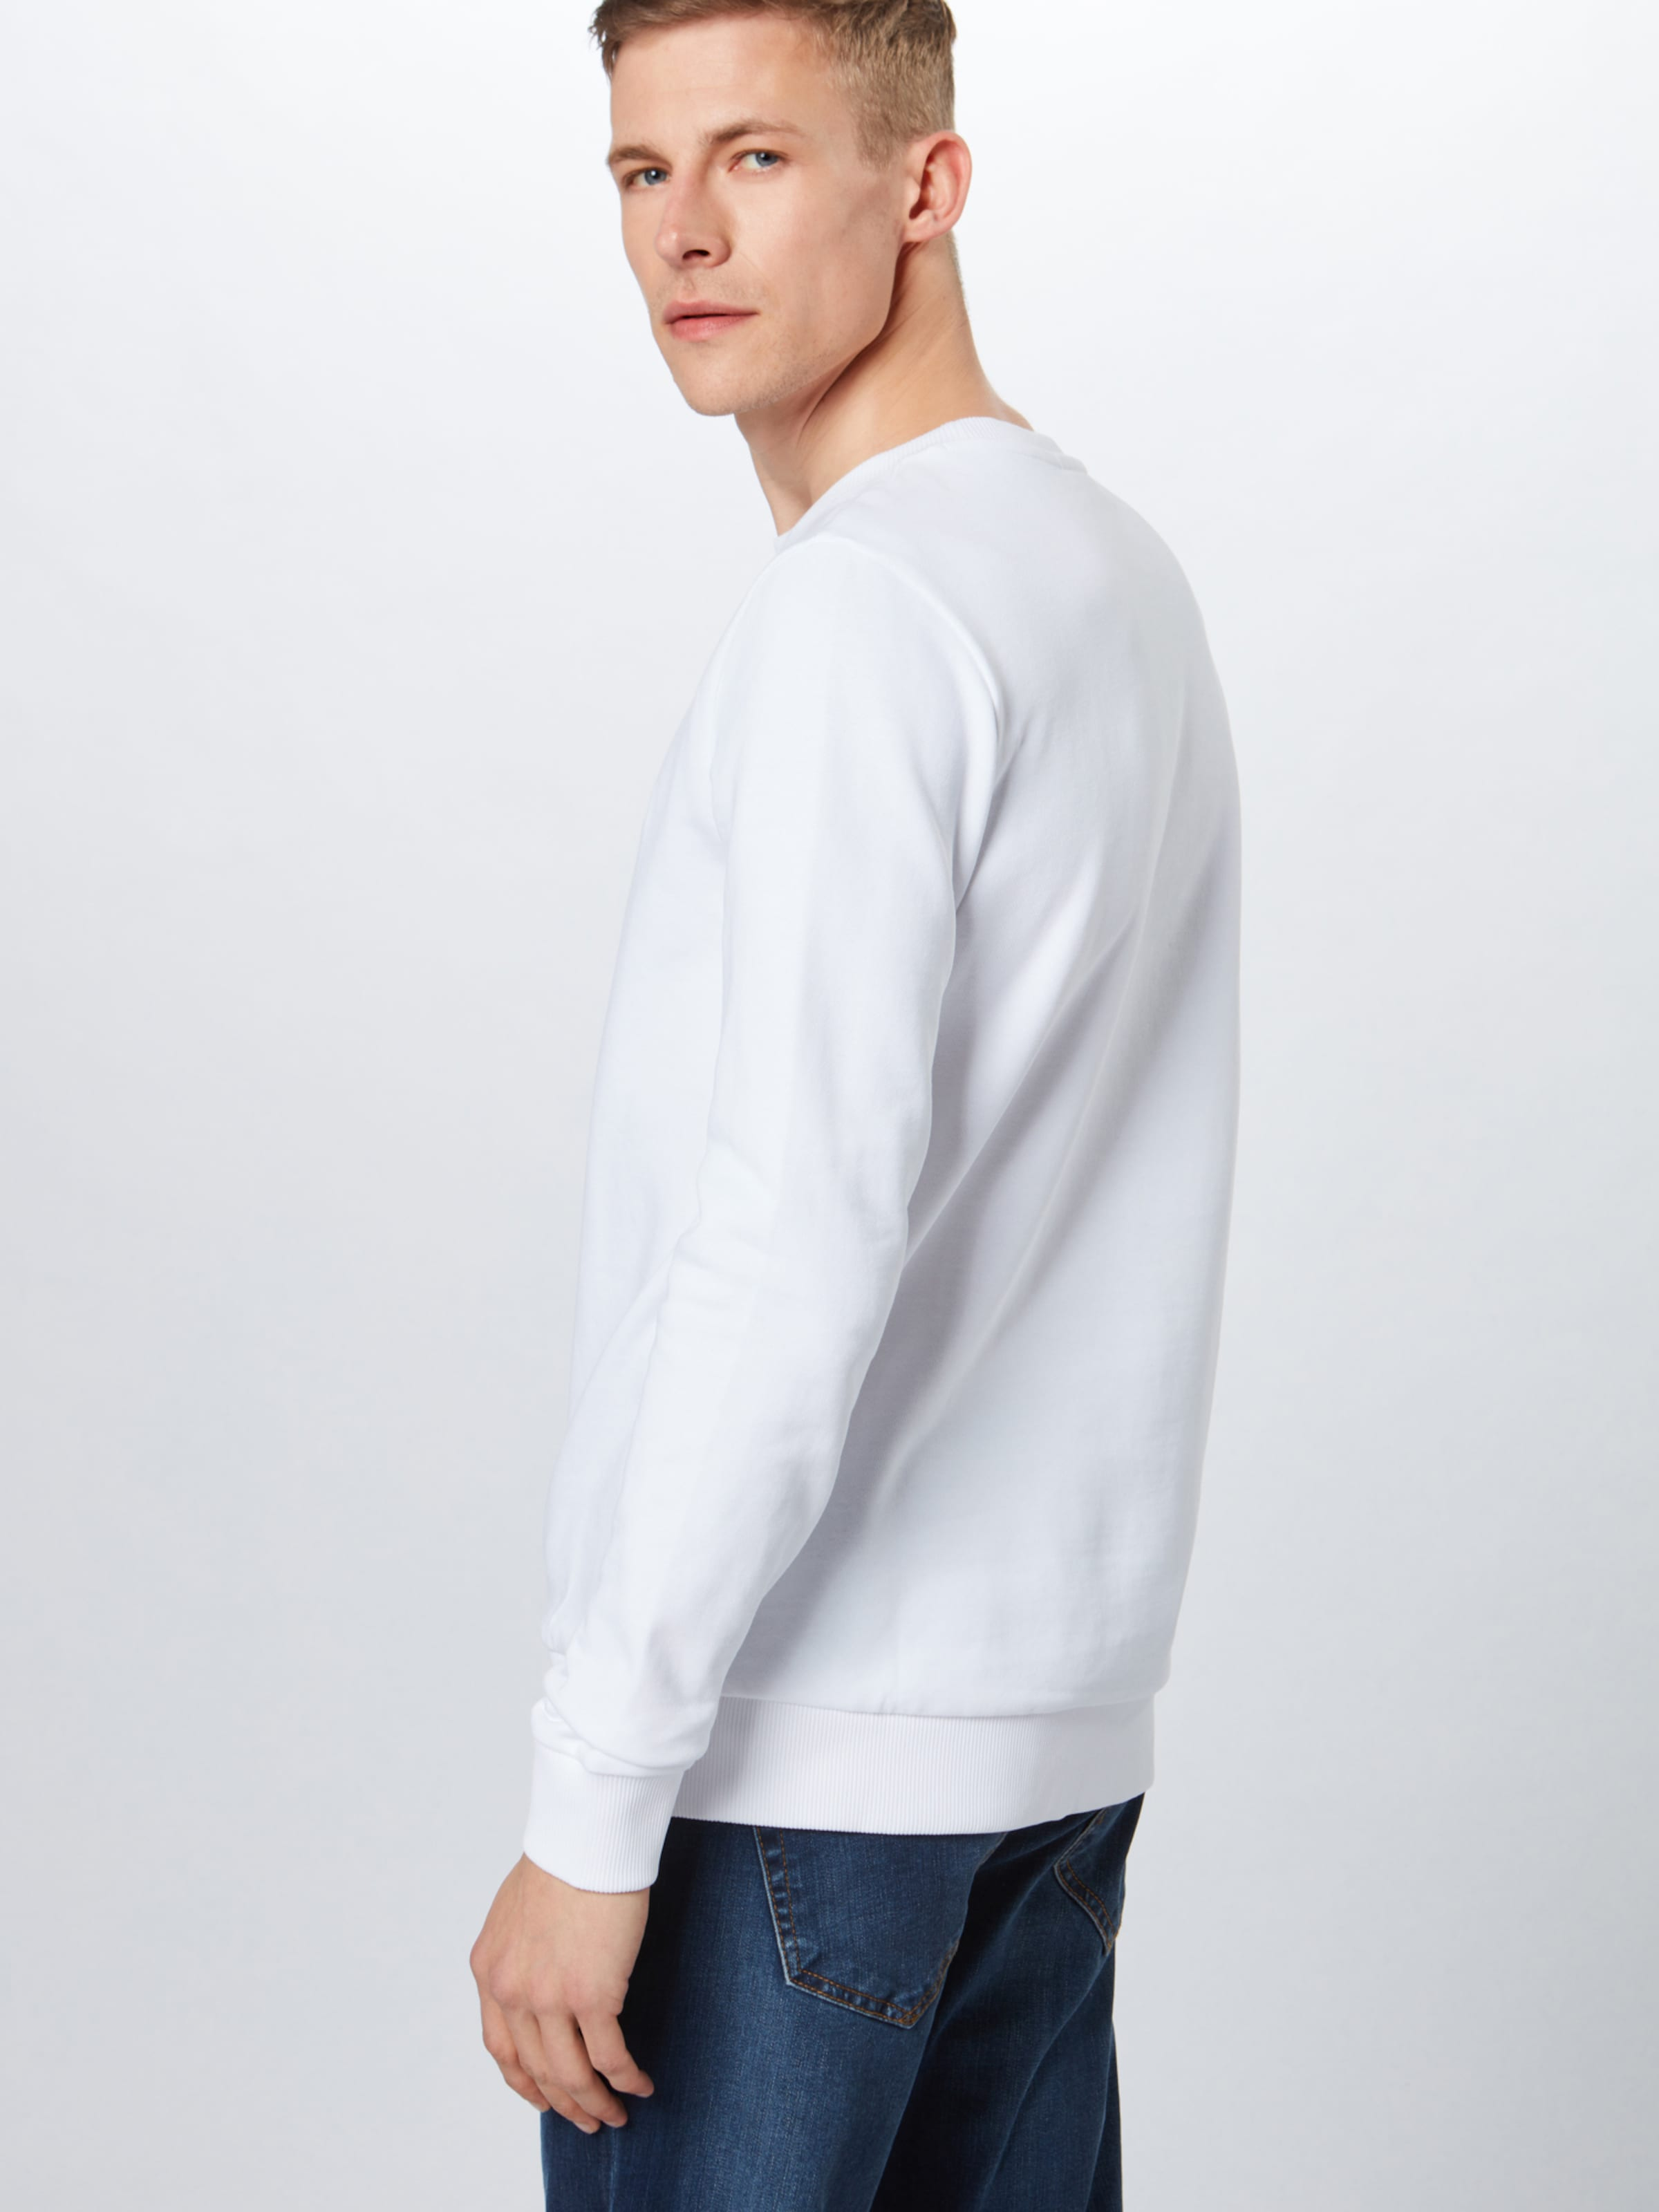 'drick u2' Sweatshirt Hugo In Weiß gfYb6y7